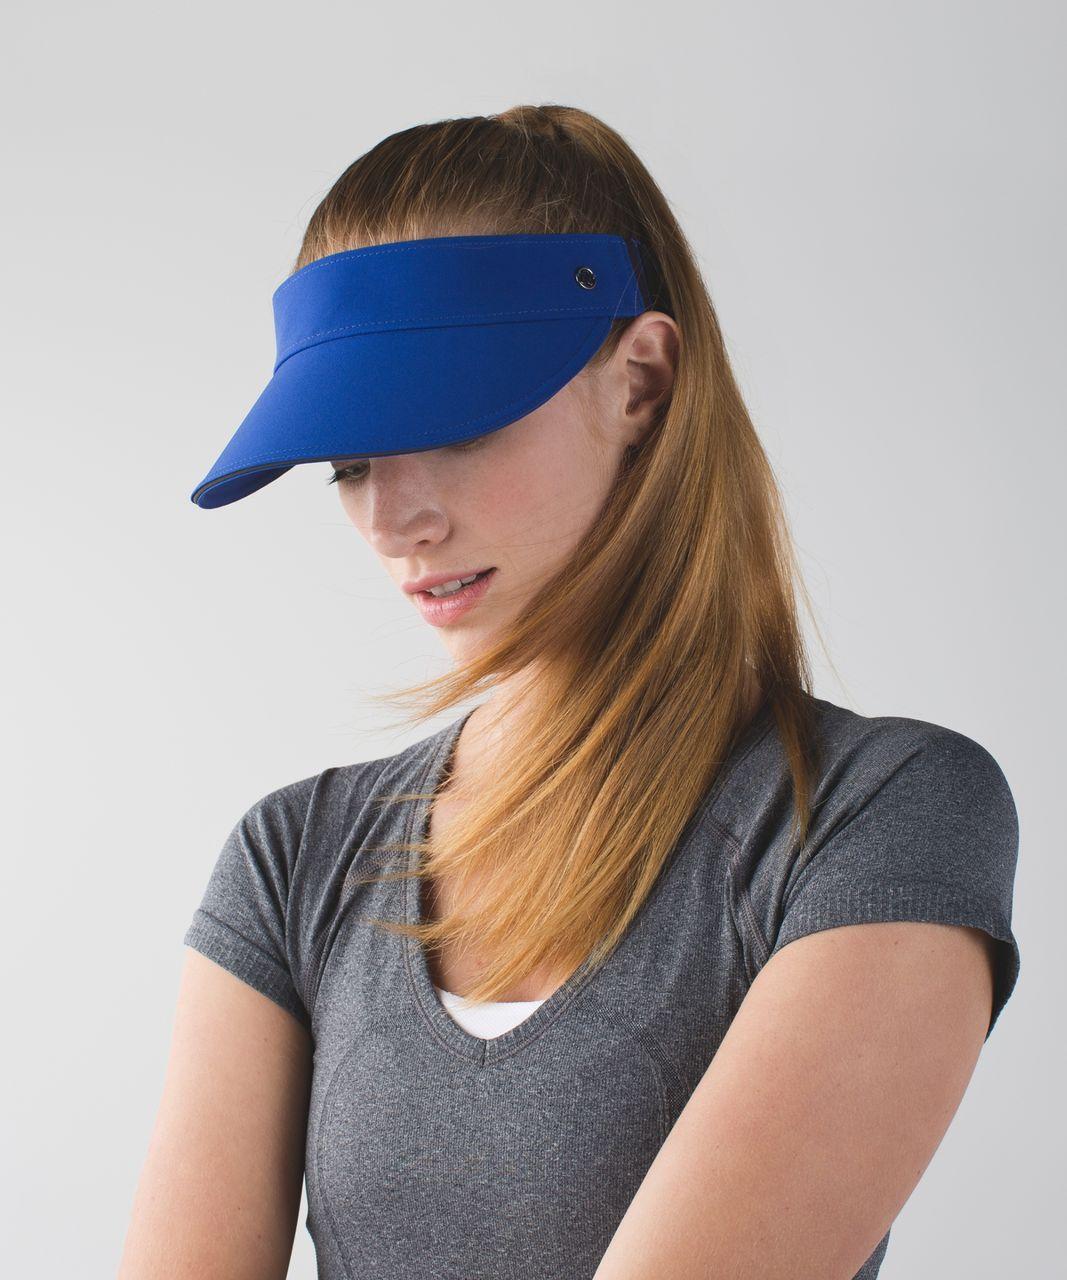 Lululemon Fast Paced Run Visor - Sapphire Blue